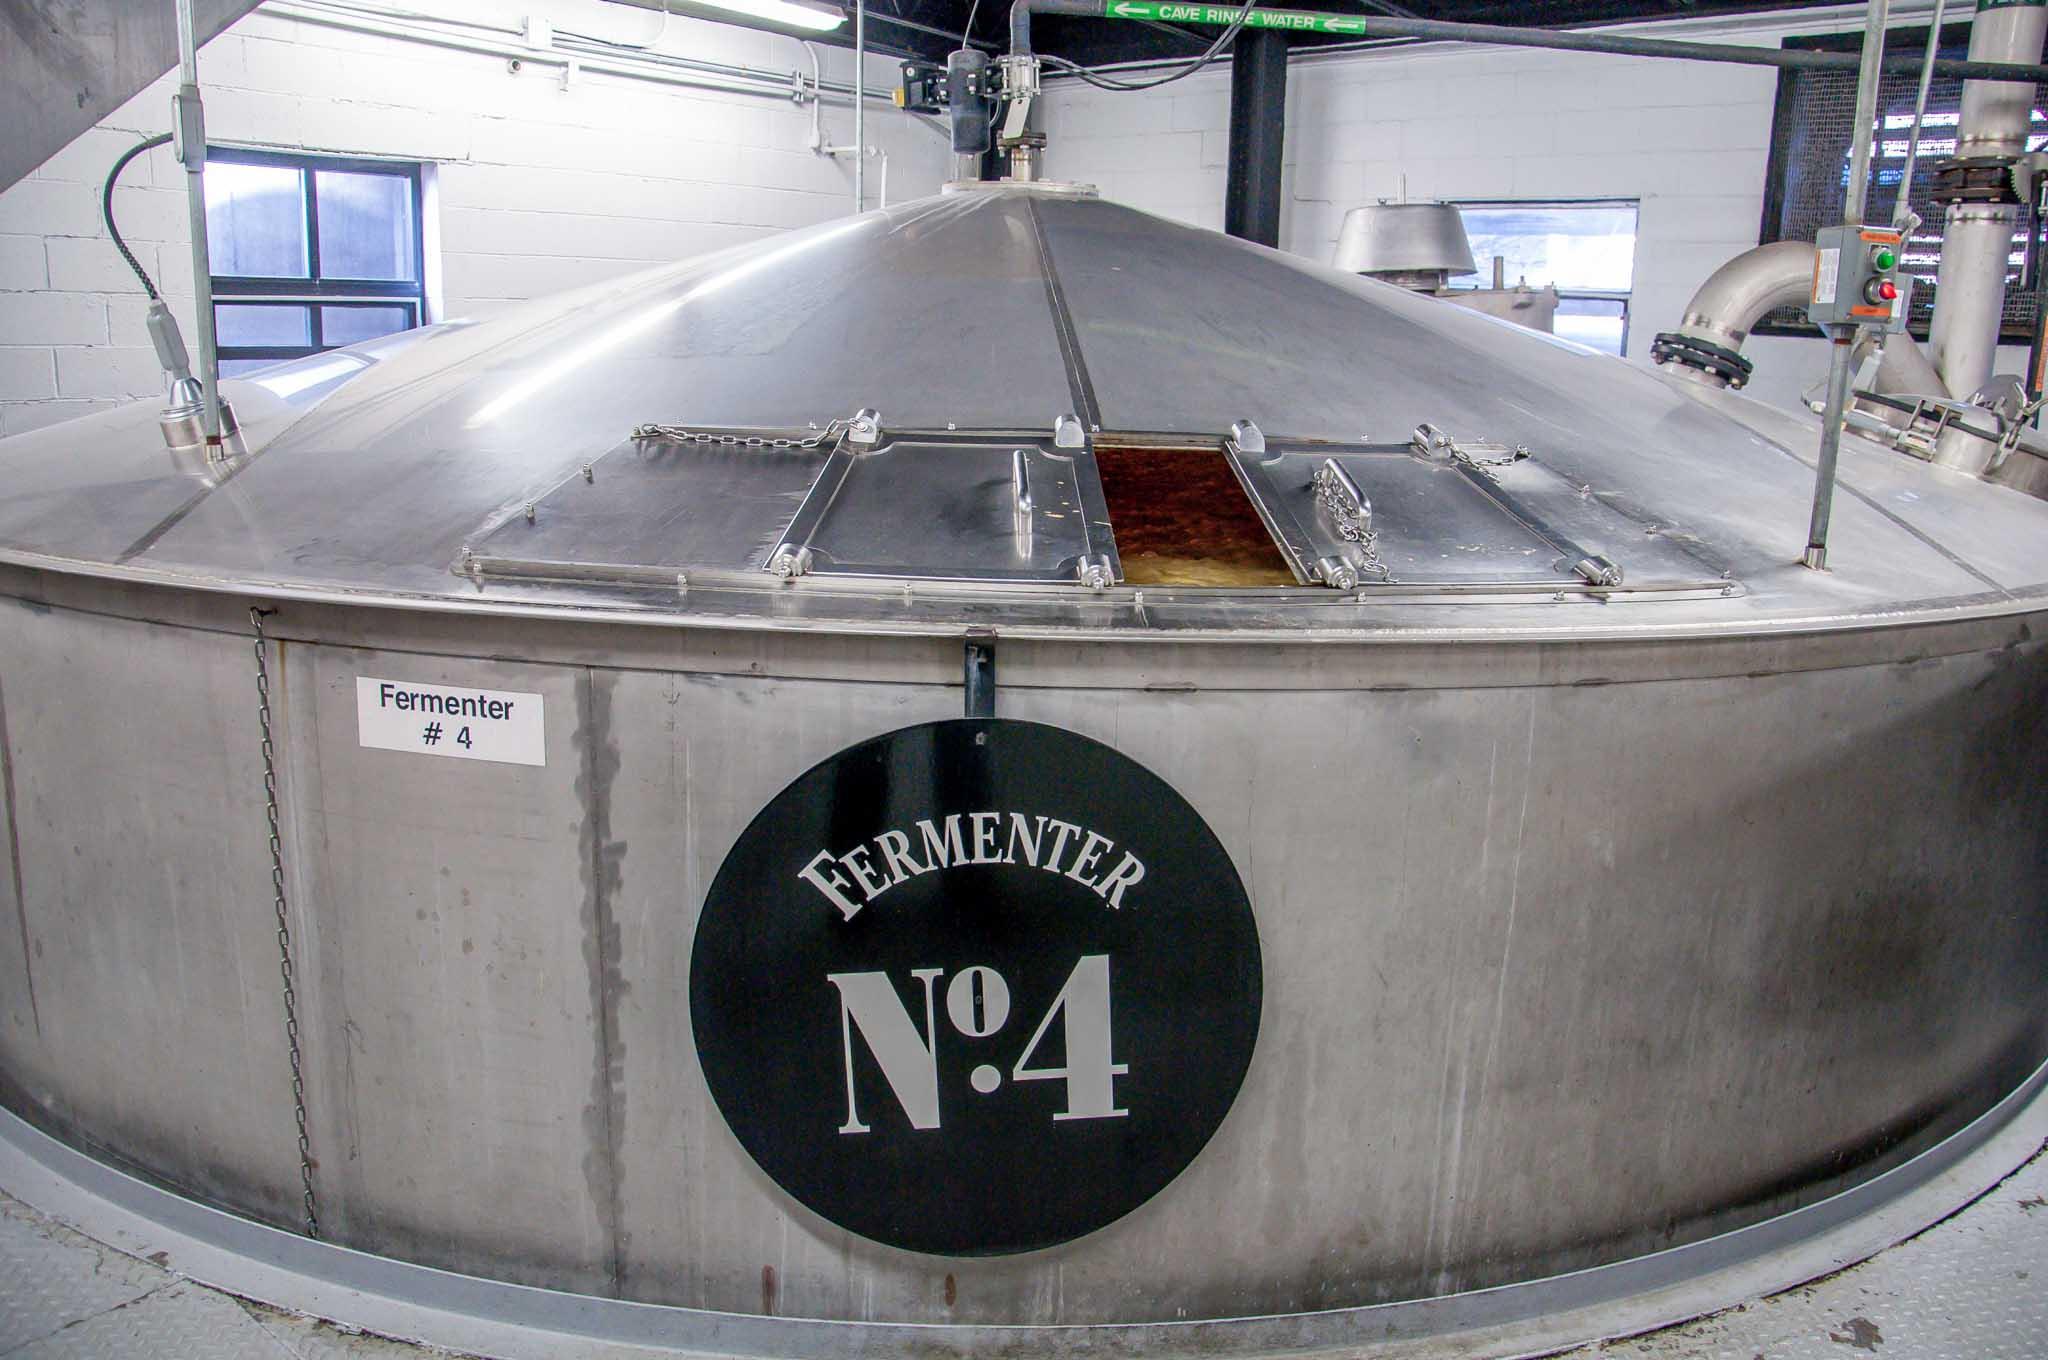 One of the fermentation tanks at Jack Daniels Lynchburg